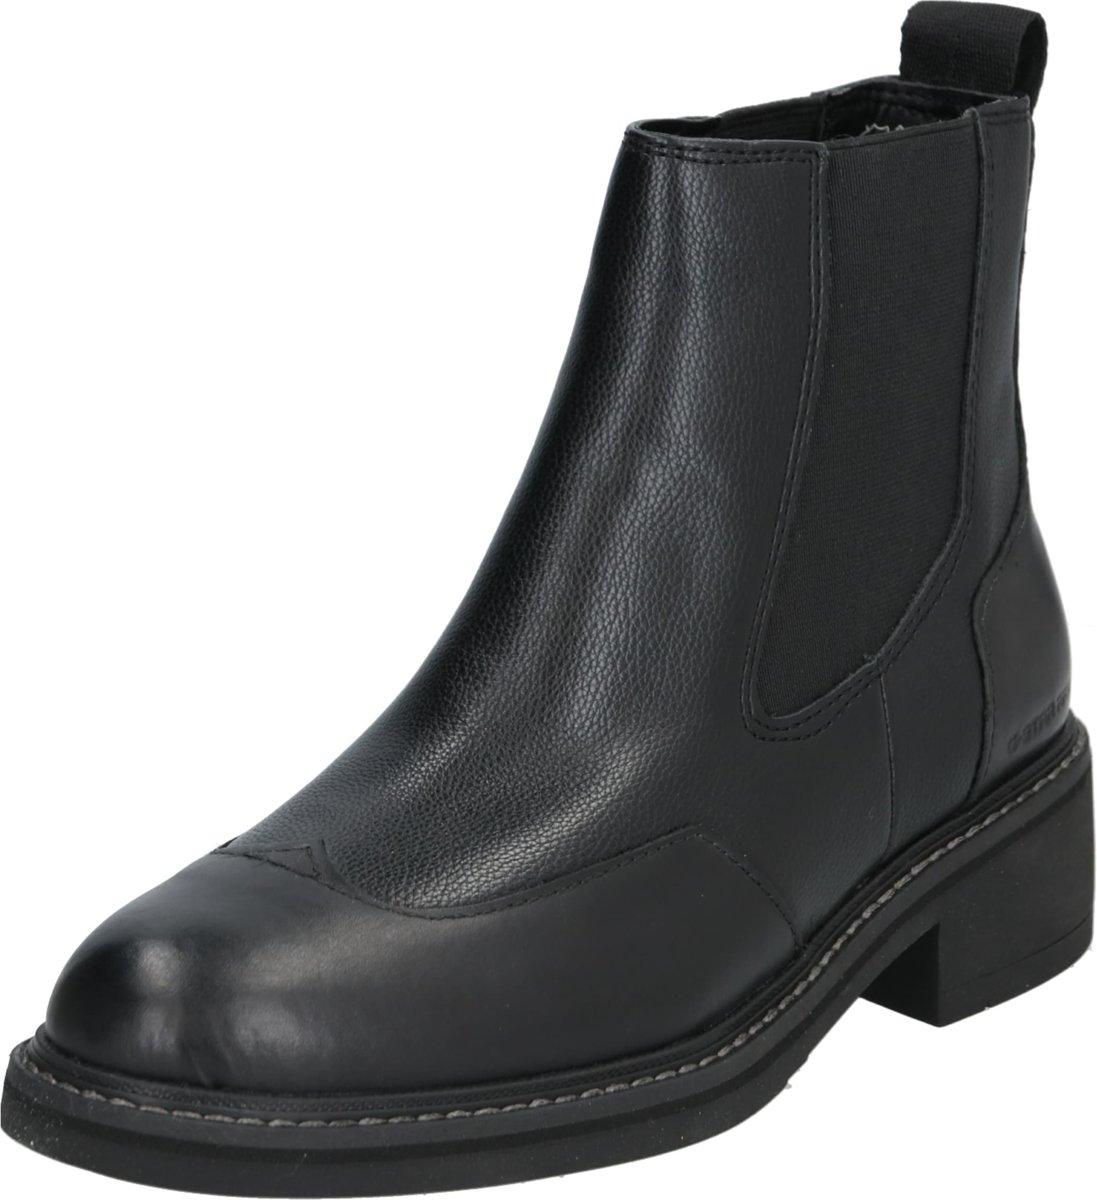 G Star RAW Tacoma Boot leren enkellaarzen zwart   wehkamp